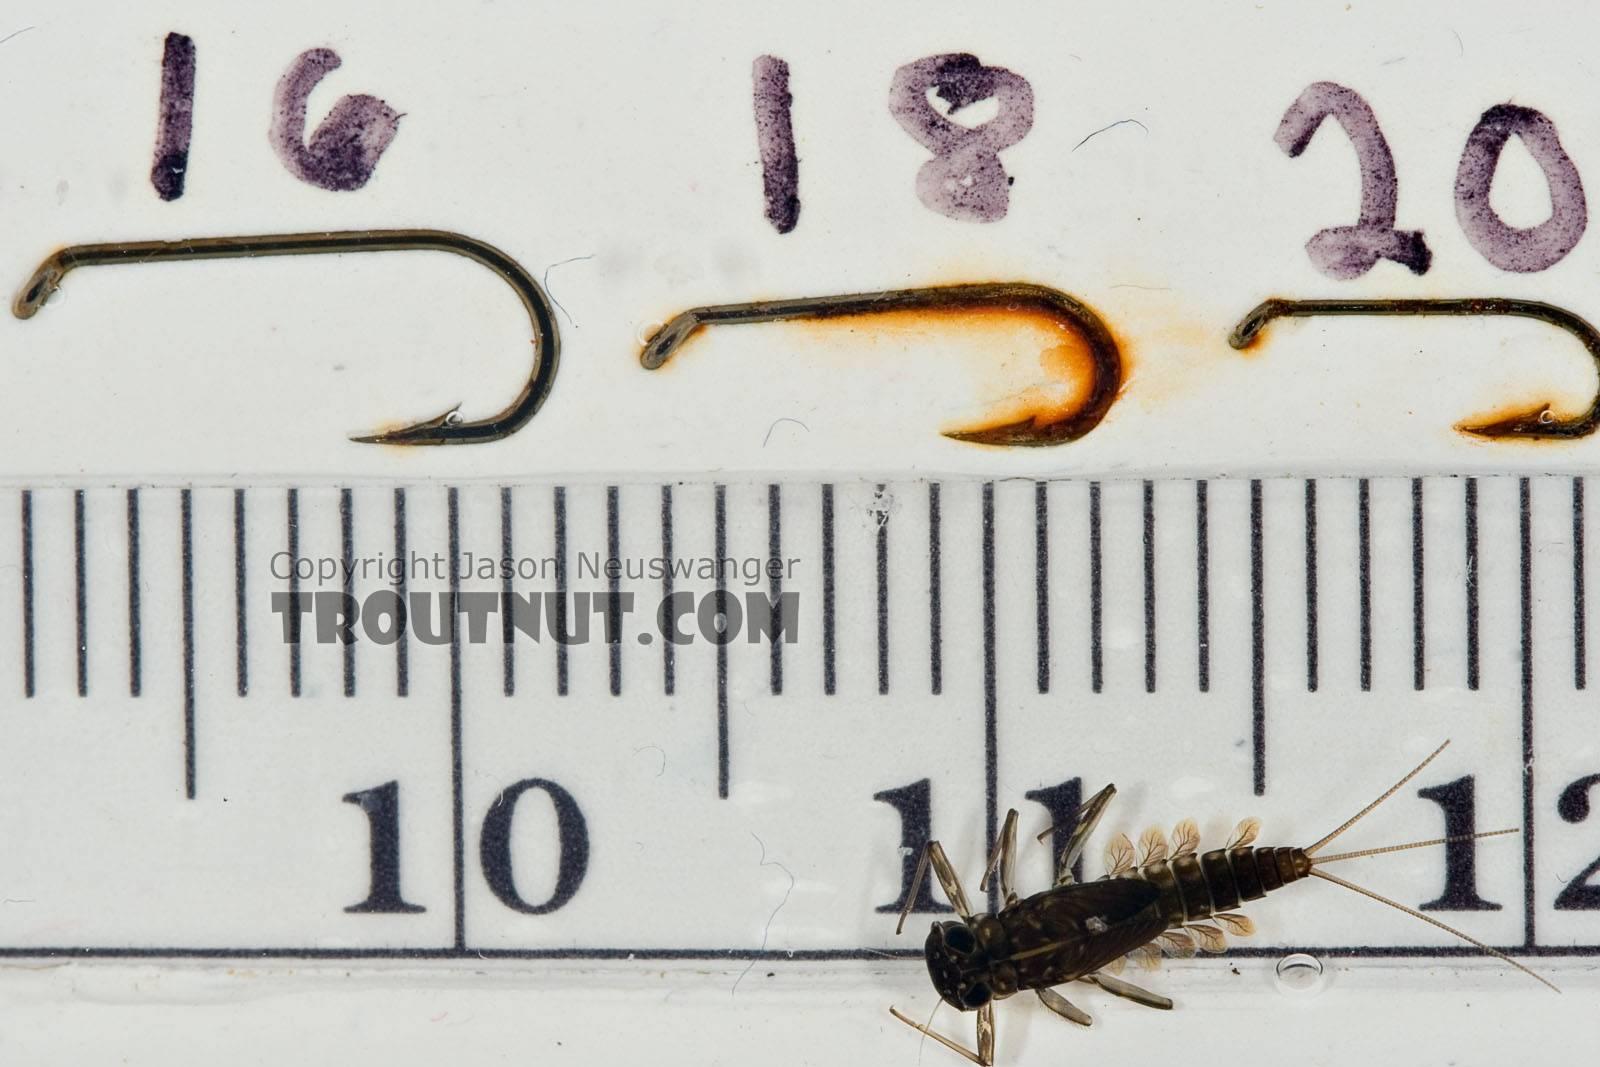 Cinygmula subaequalis (Small Gordon Quill) Mayfly Nymph from Paradise Creek in Pennsylvania